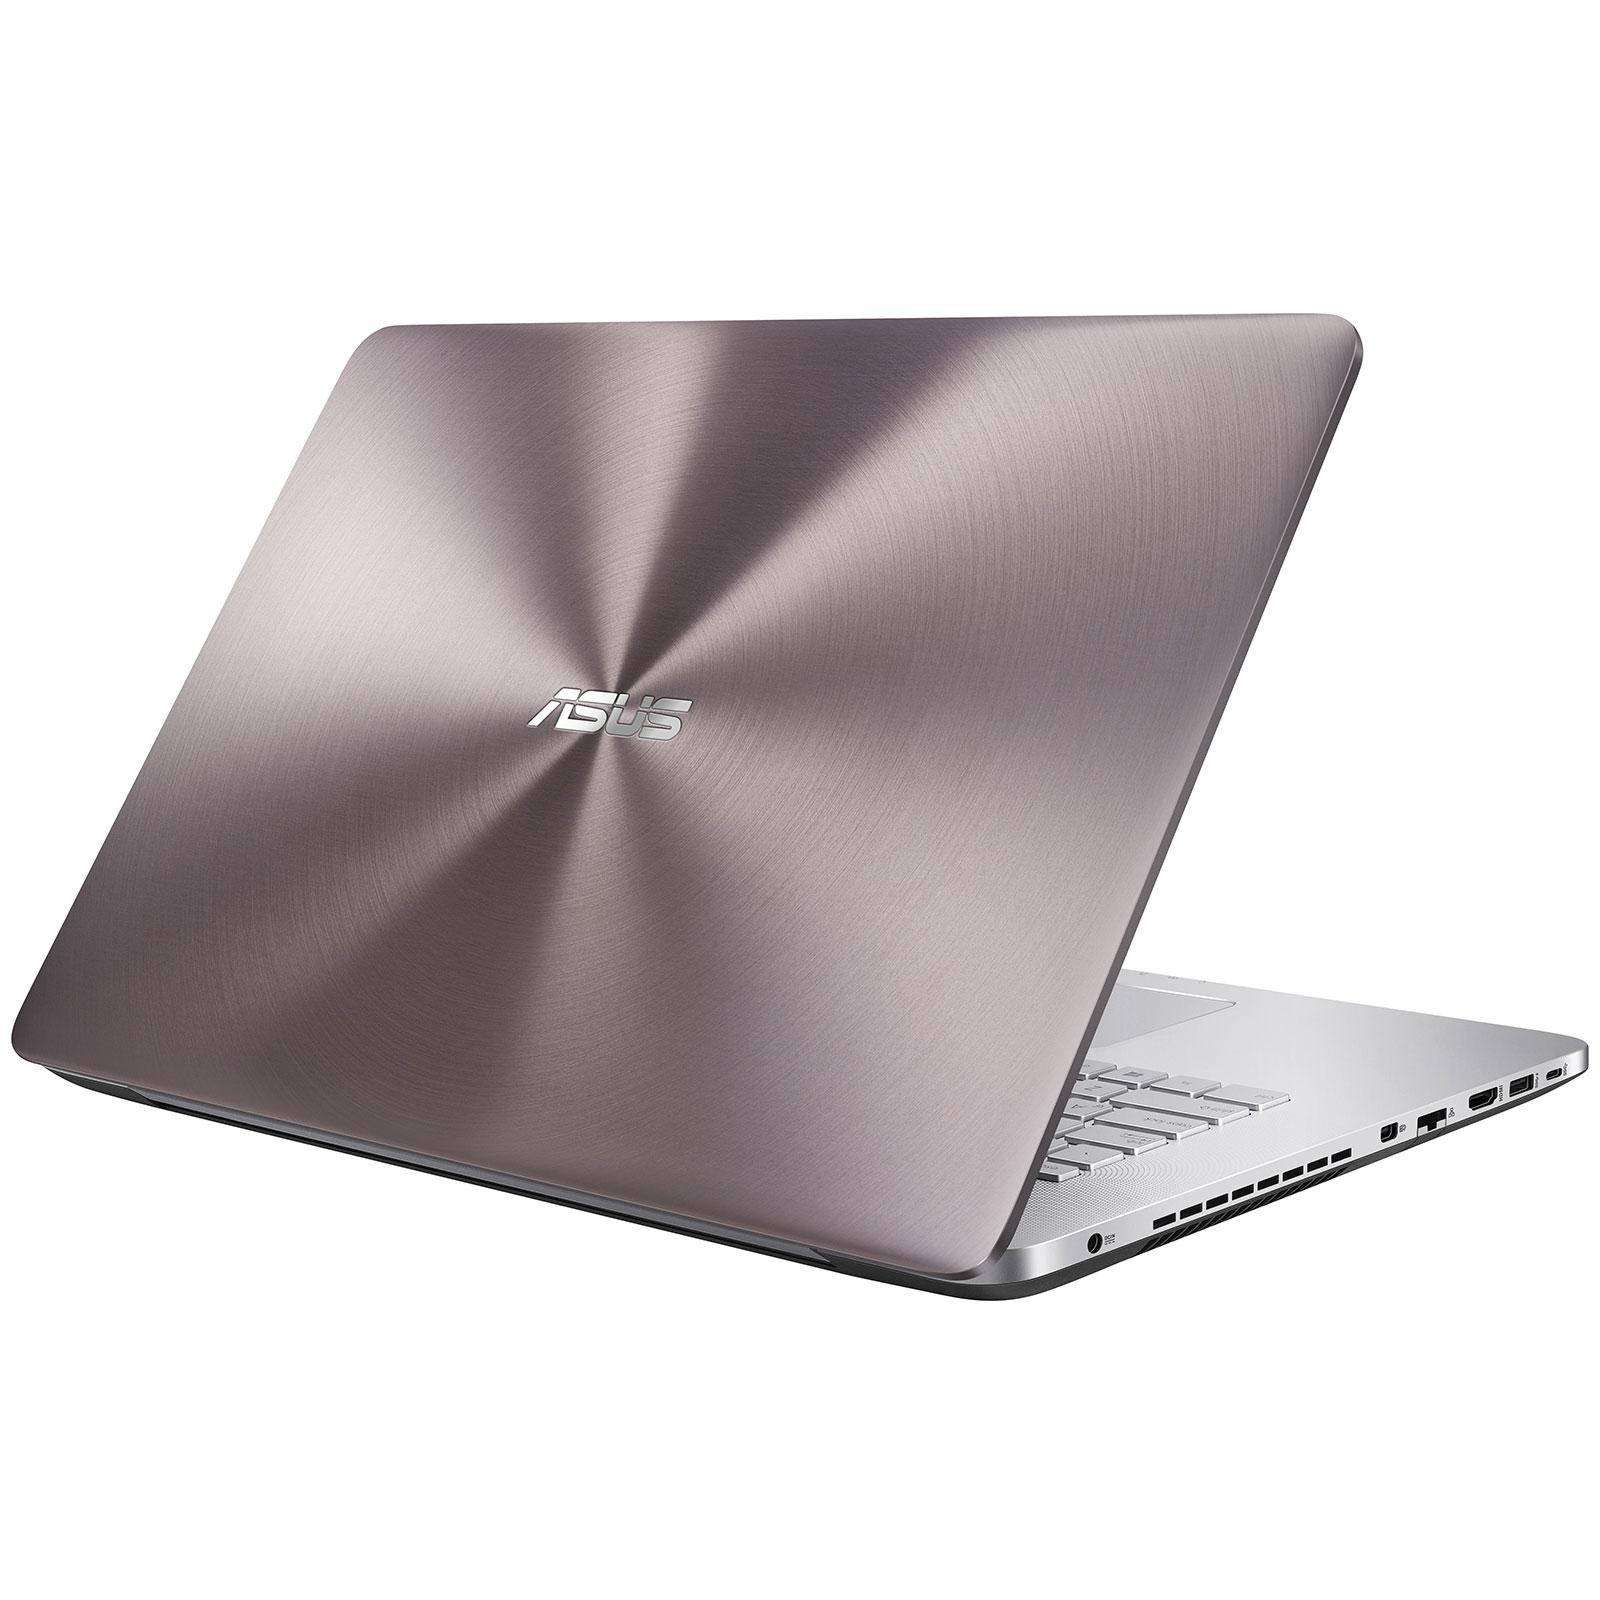 Ноутбук Lenovo Yoga 720-15IKB 80X7002WRK (Intel Core i7-7700HQ 2.8 GHz/16384Mb/512Gb/No ODD/nVidia GeForce GTX 1050 4096Mb/Wi-Fi/Bluetooth/Cam/15.6/1920x1080/Touchscreen/Windows 10 64-bit)